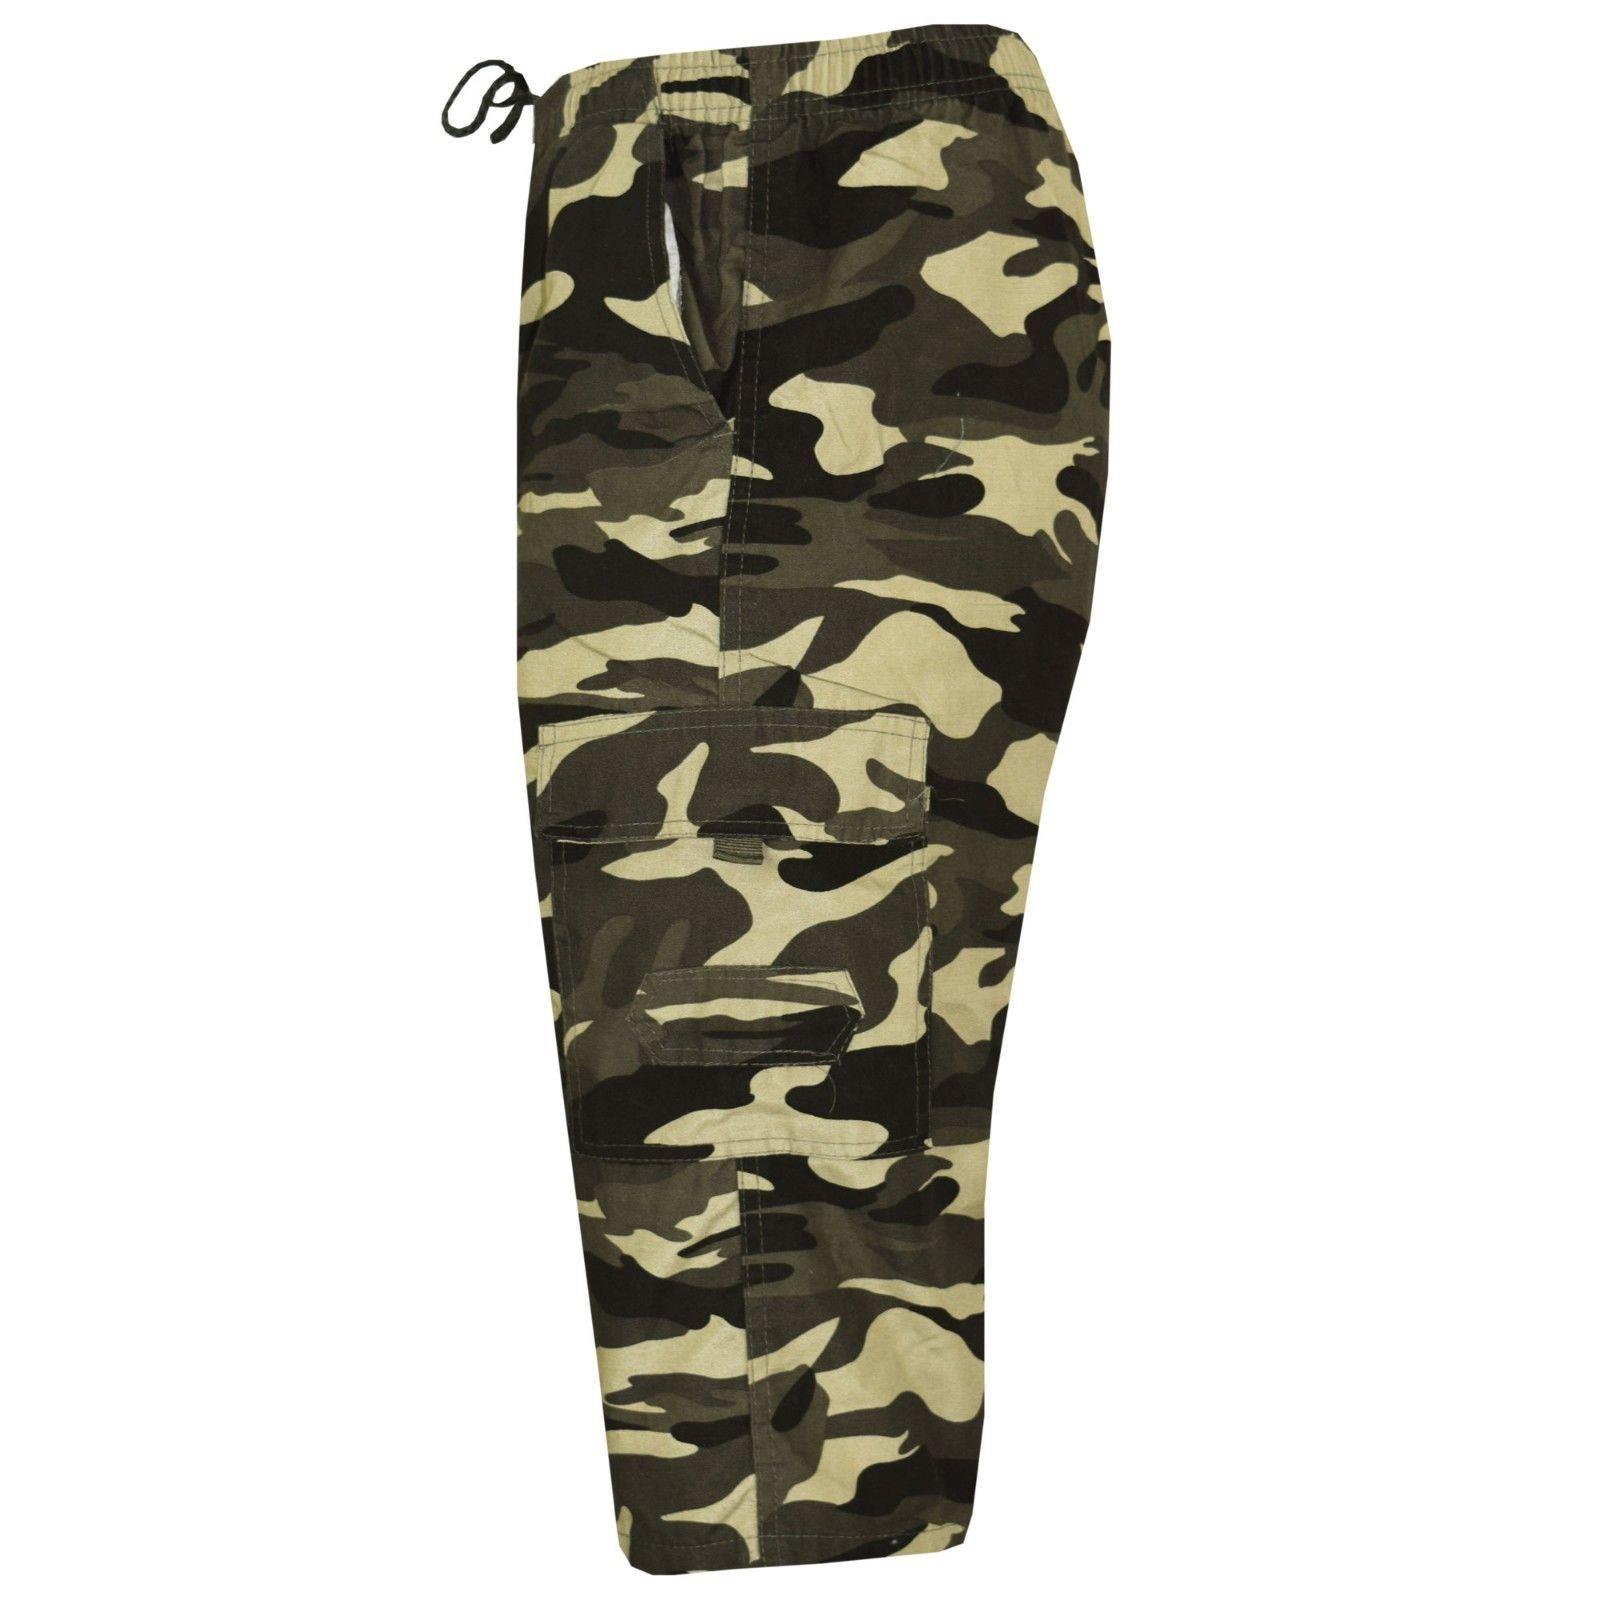 Mens 3//4 Army Elasticated Waist Long Shorts Military Combat Cargo Pockets Camo